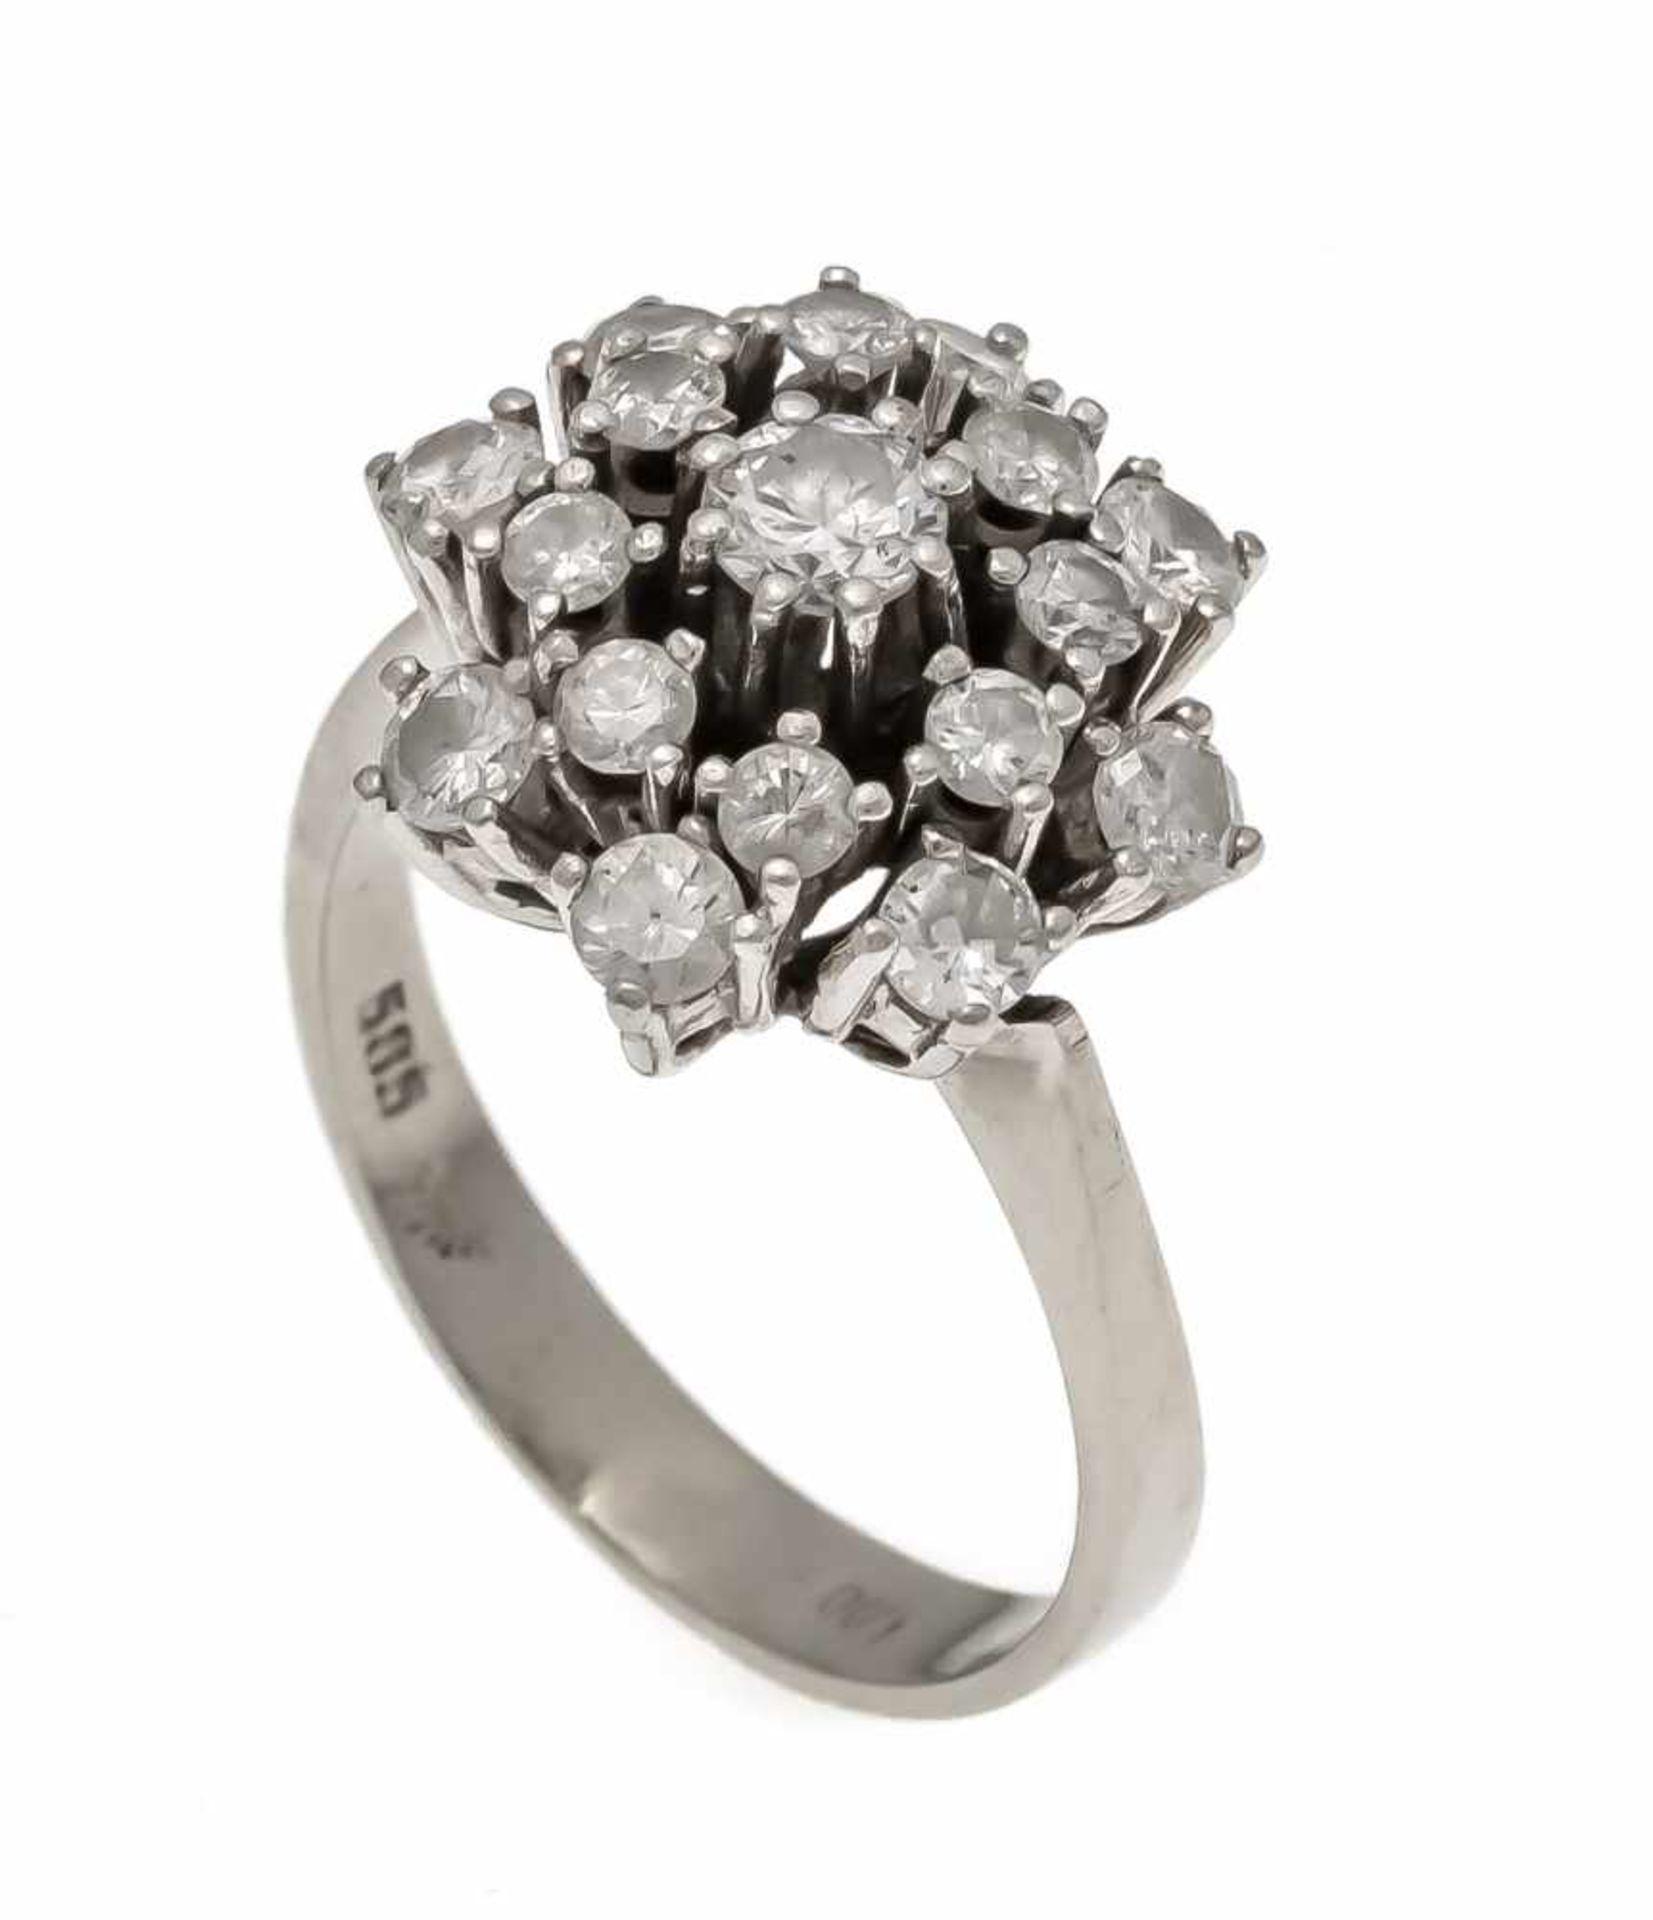 Brillant-Ring WG 585/000 mit Brillanten, zus. 1,0 ct W/SI-PI, RG 48, 3,9 gDiamond ring, WG 585/